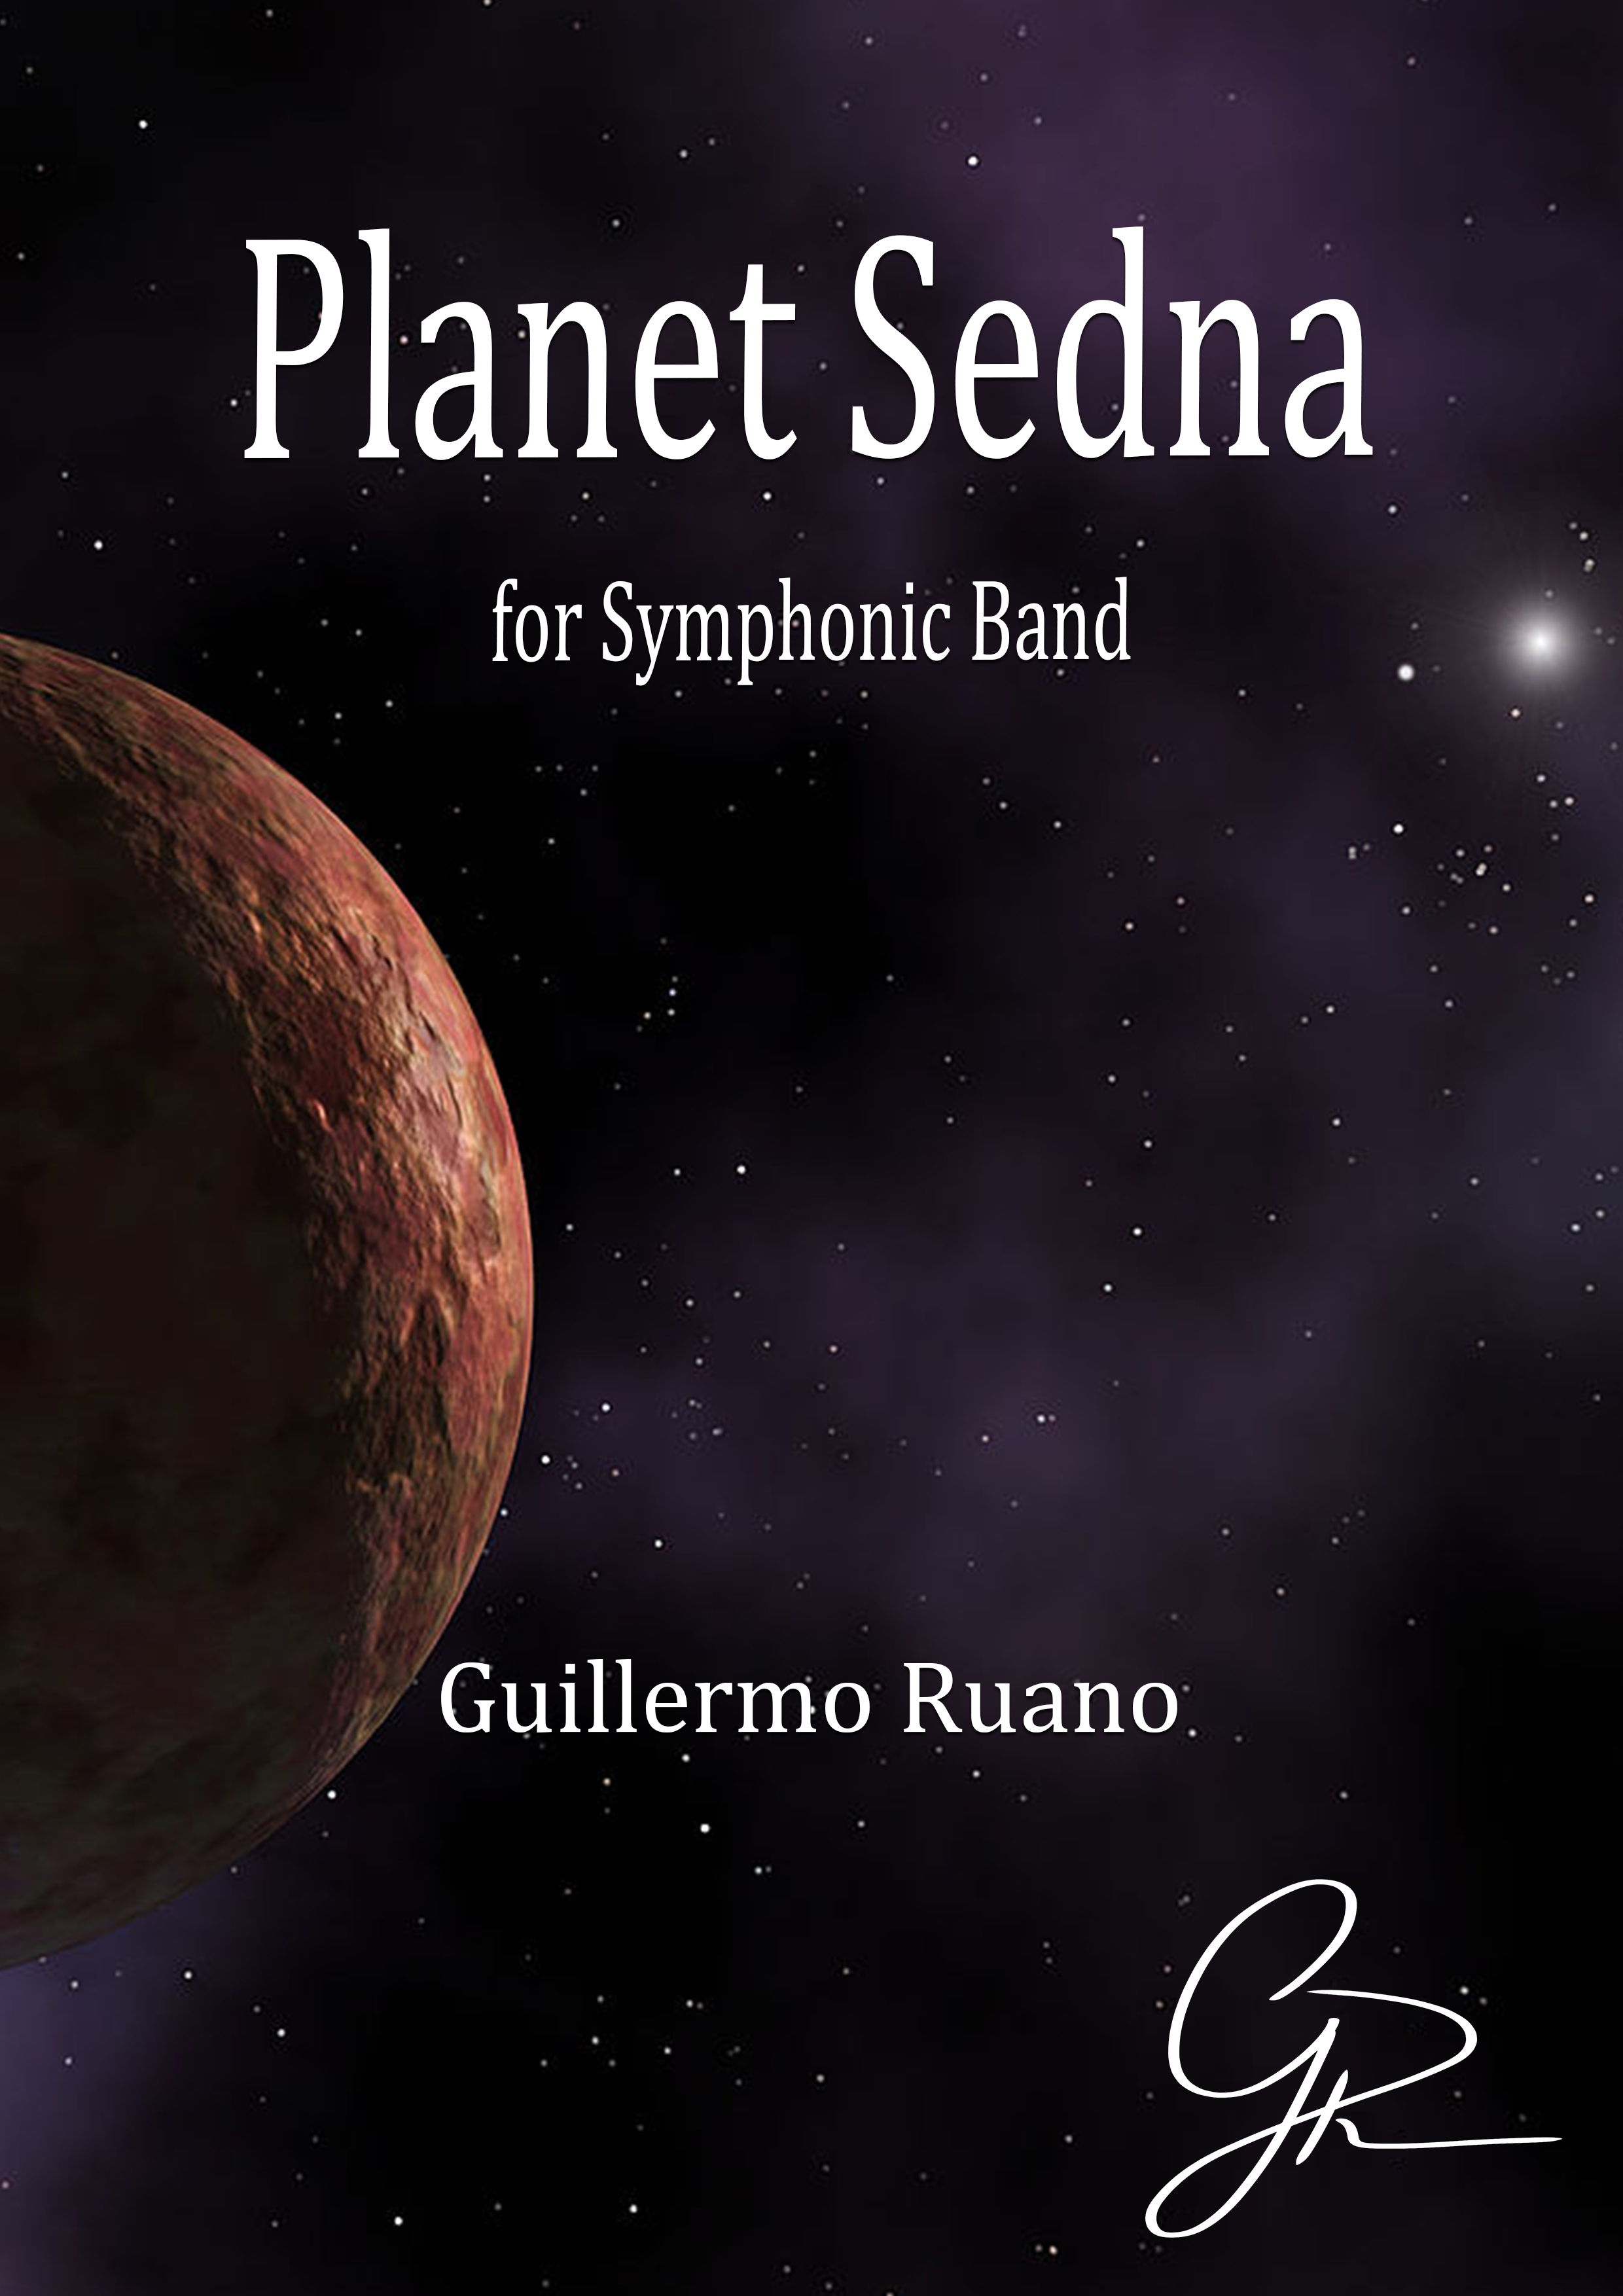 Planet Sedna